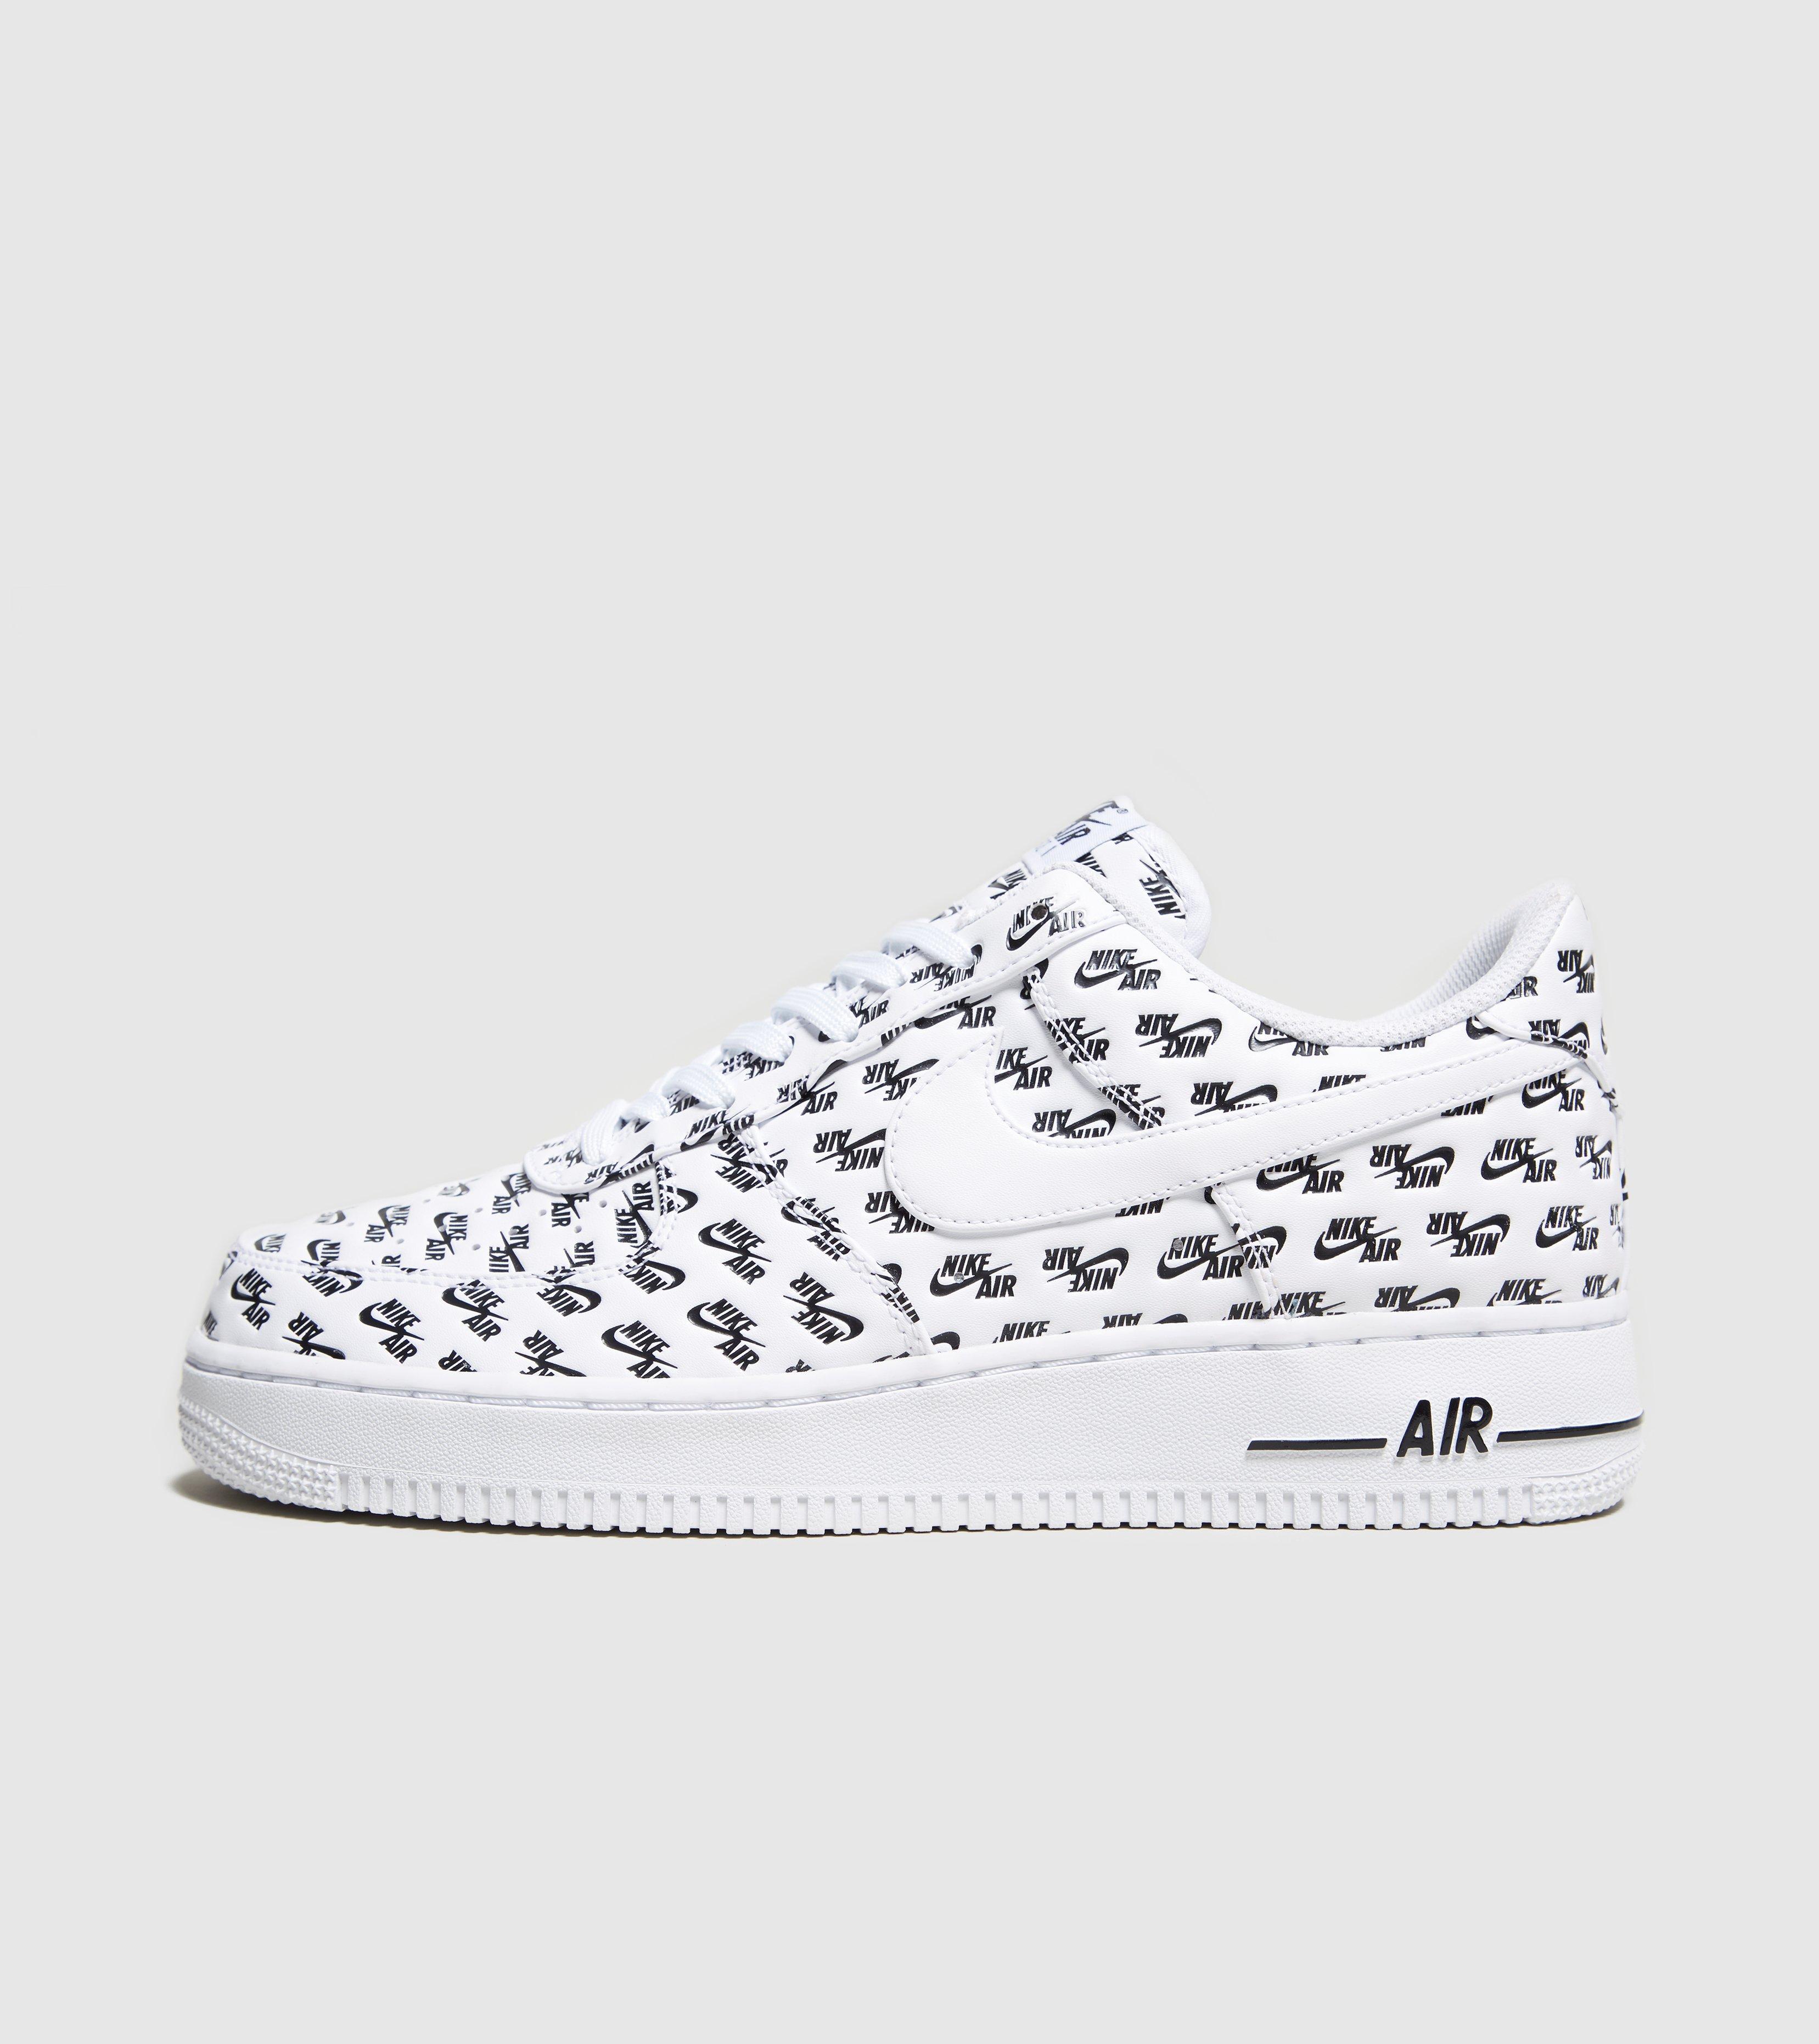 Nike Air Force 1 Scénario